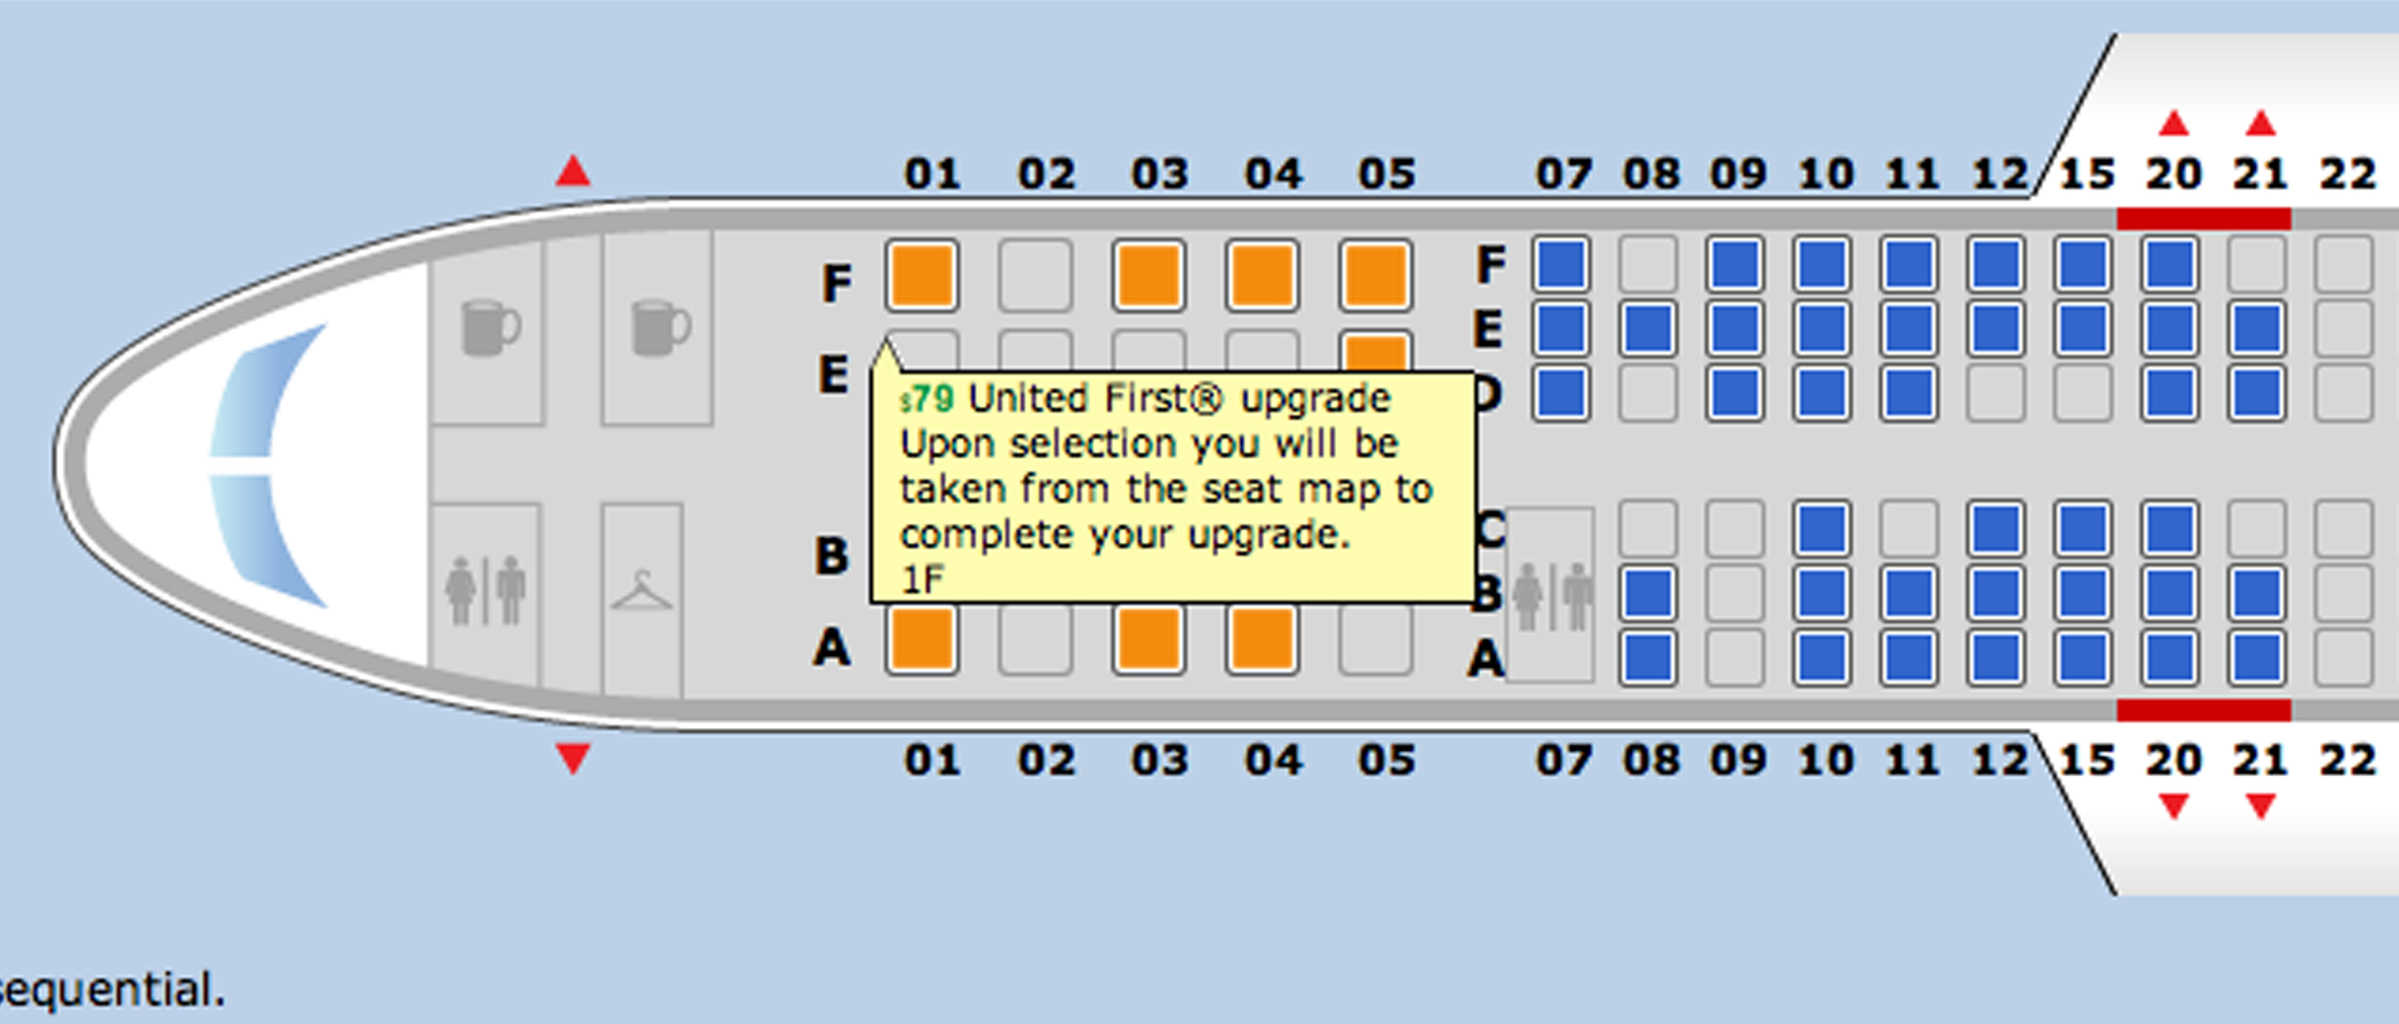 United F & E+ Paid Flight Upgrades – Worth It?